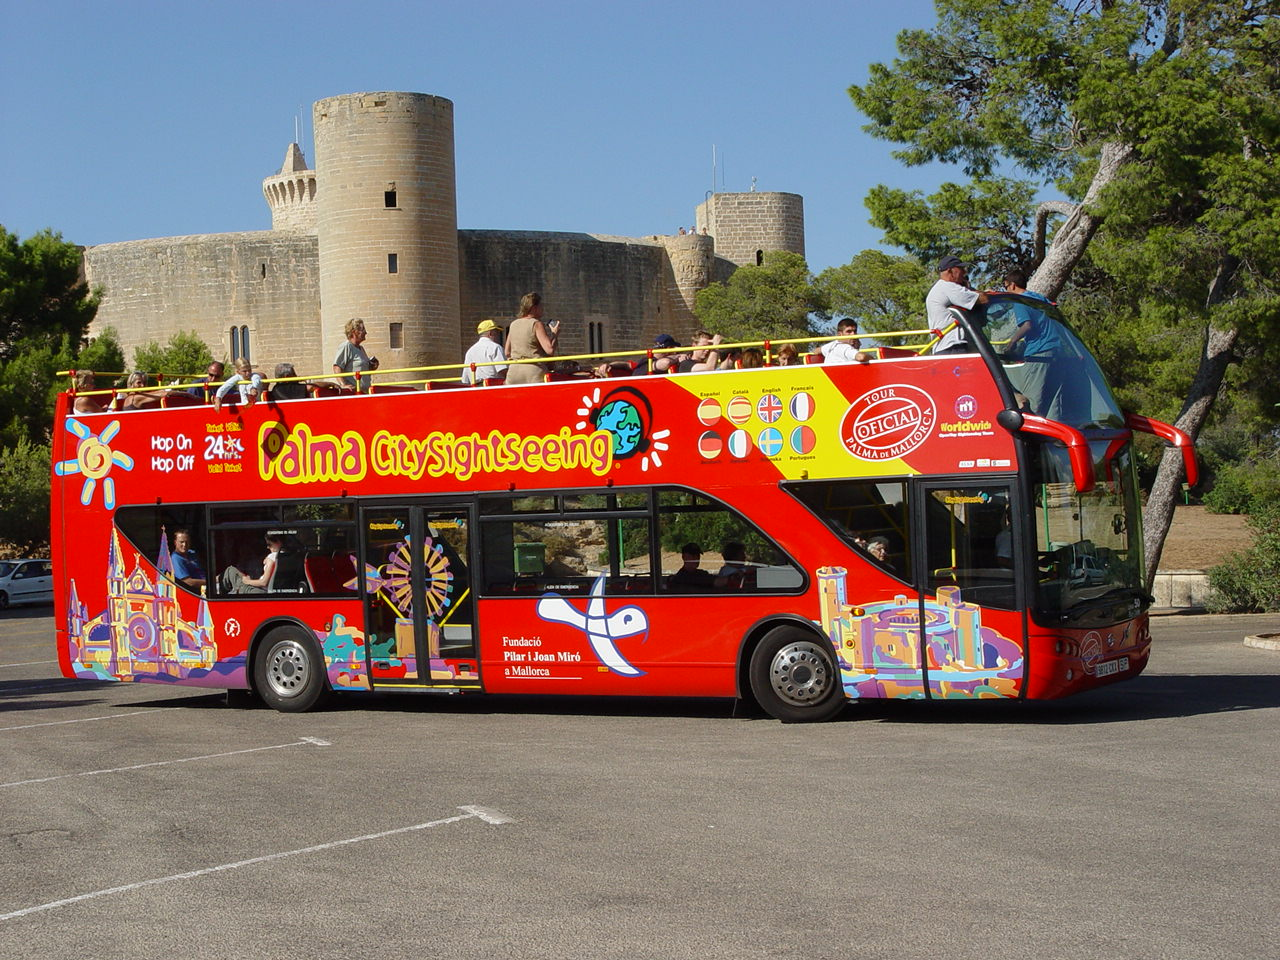 Palma de Mallorca city sightseeing